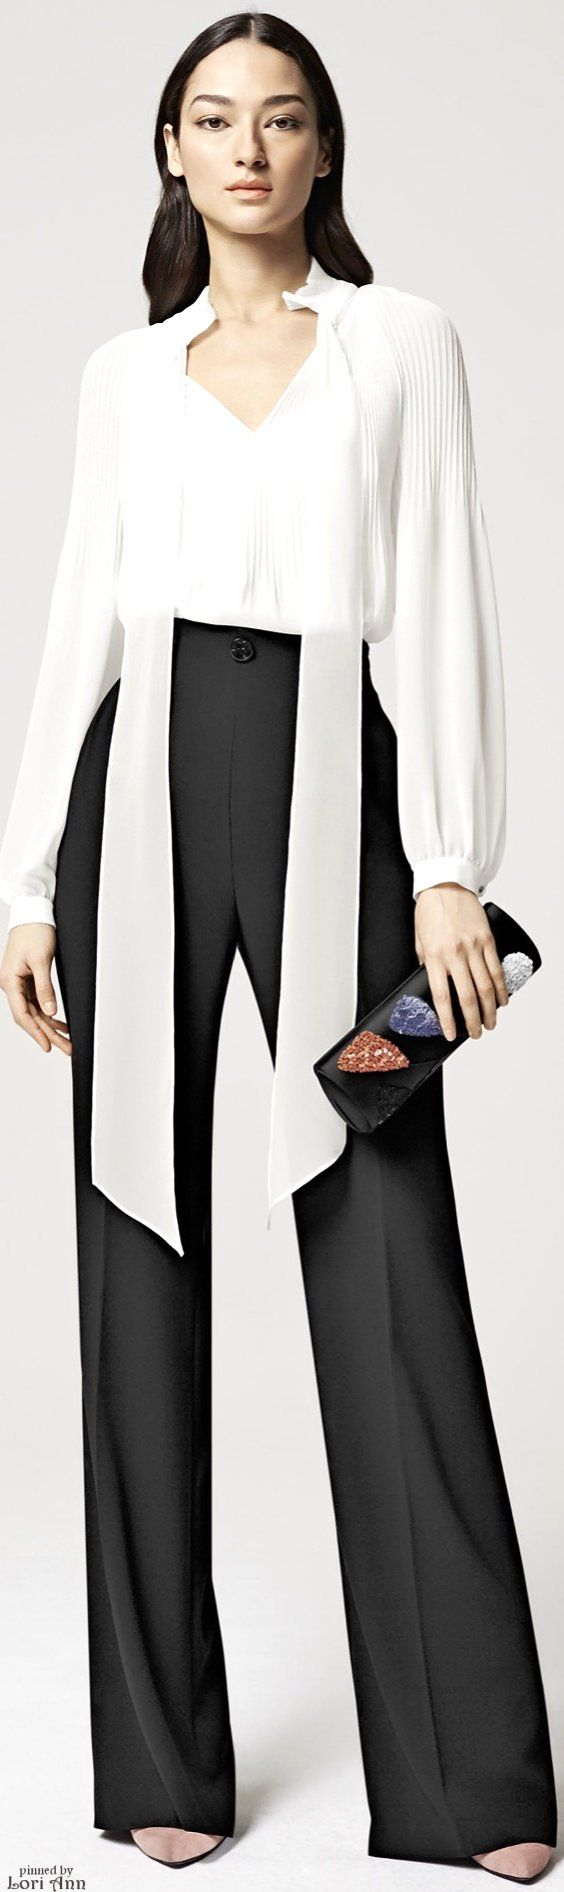 Escada Resort 2016 women fashion outfit clothing style apparel @RORESS closet ideas